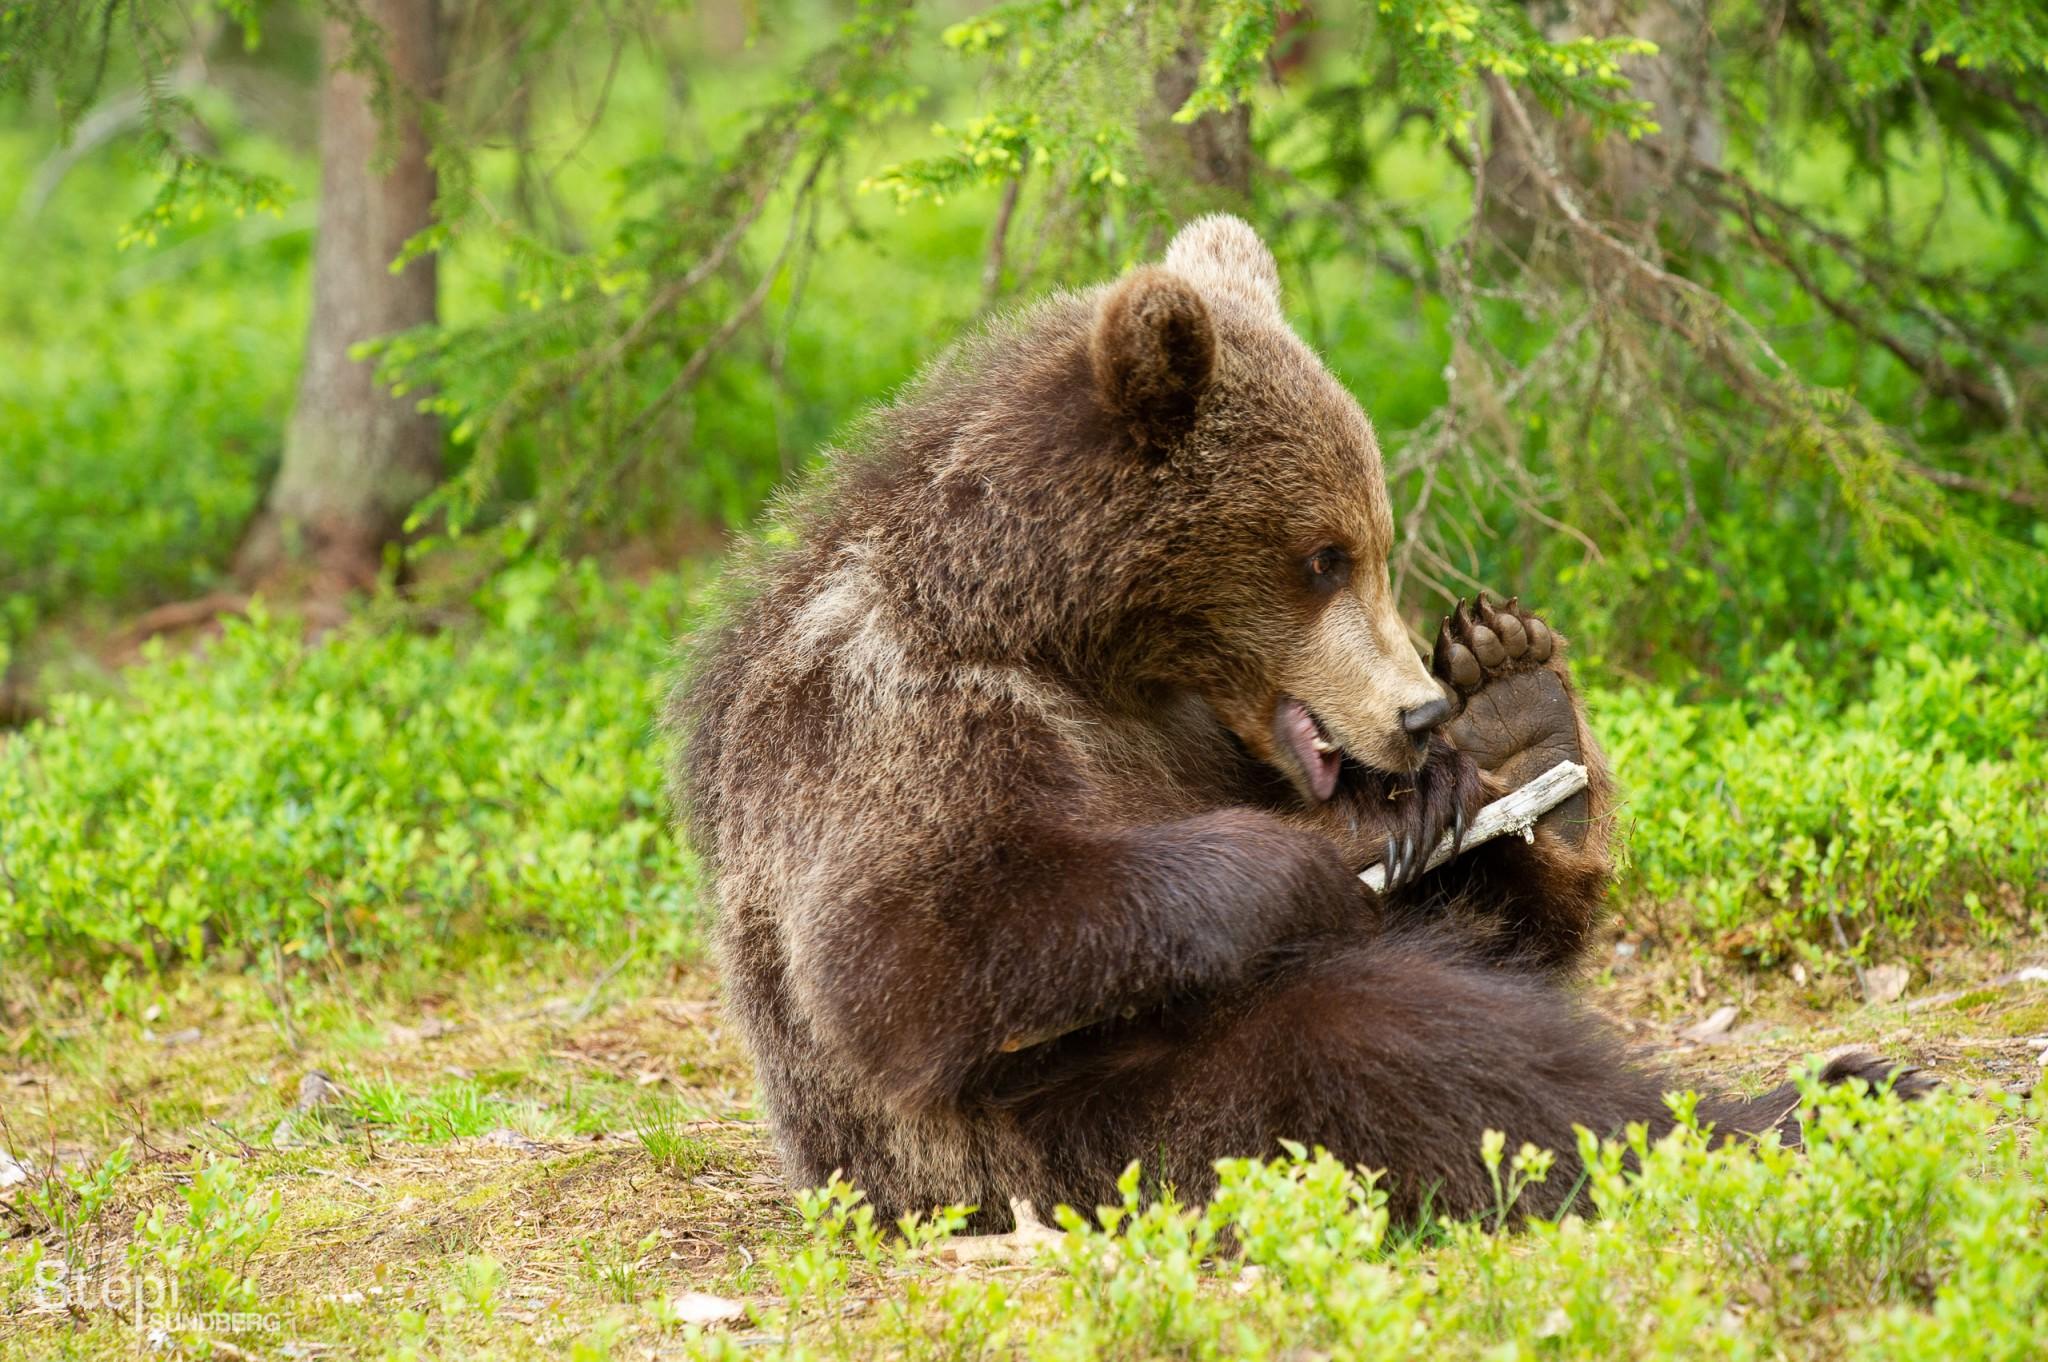 Luontokuva karhu, Valokuvaaja Stepi Sundberg